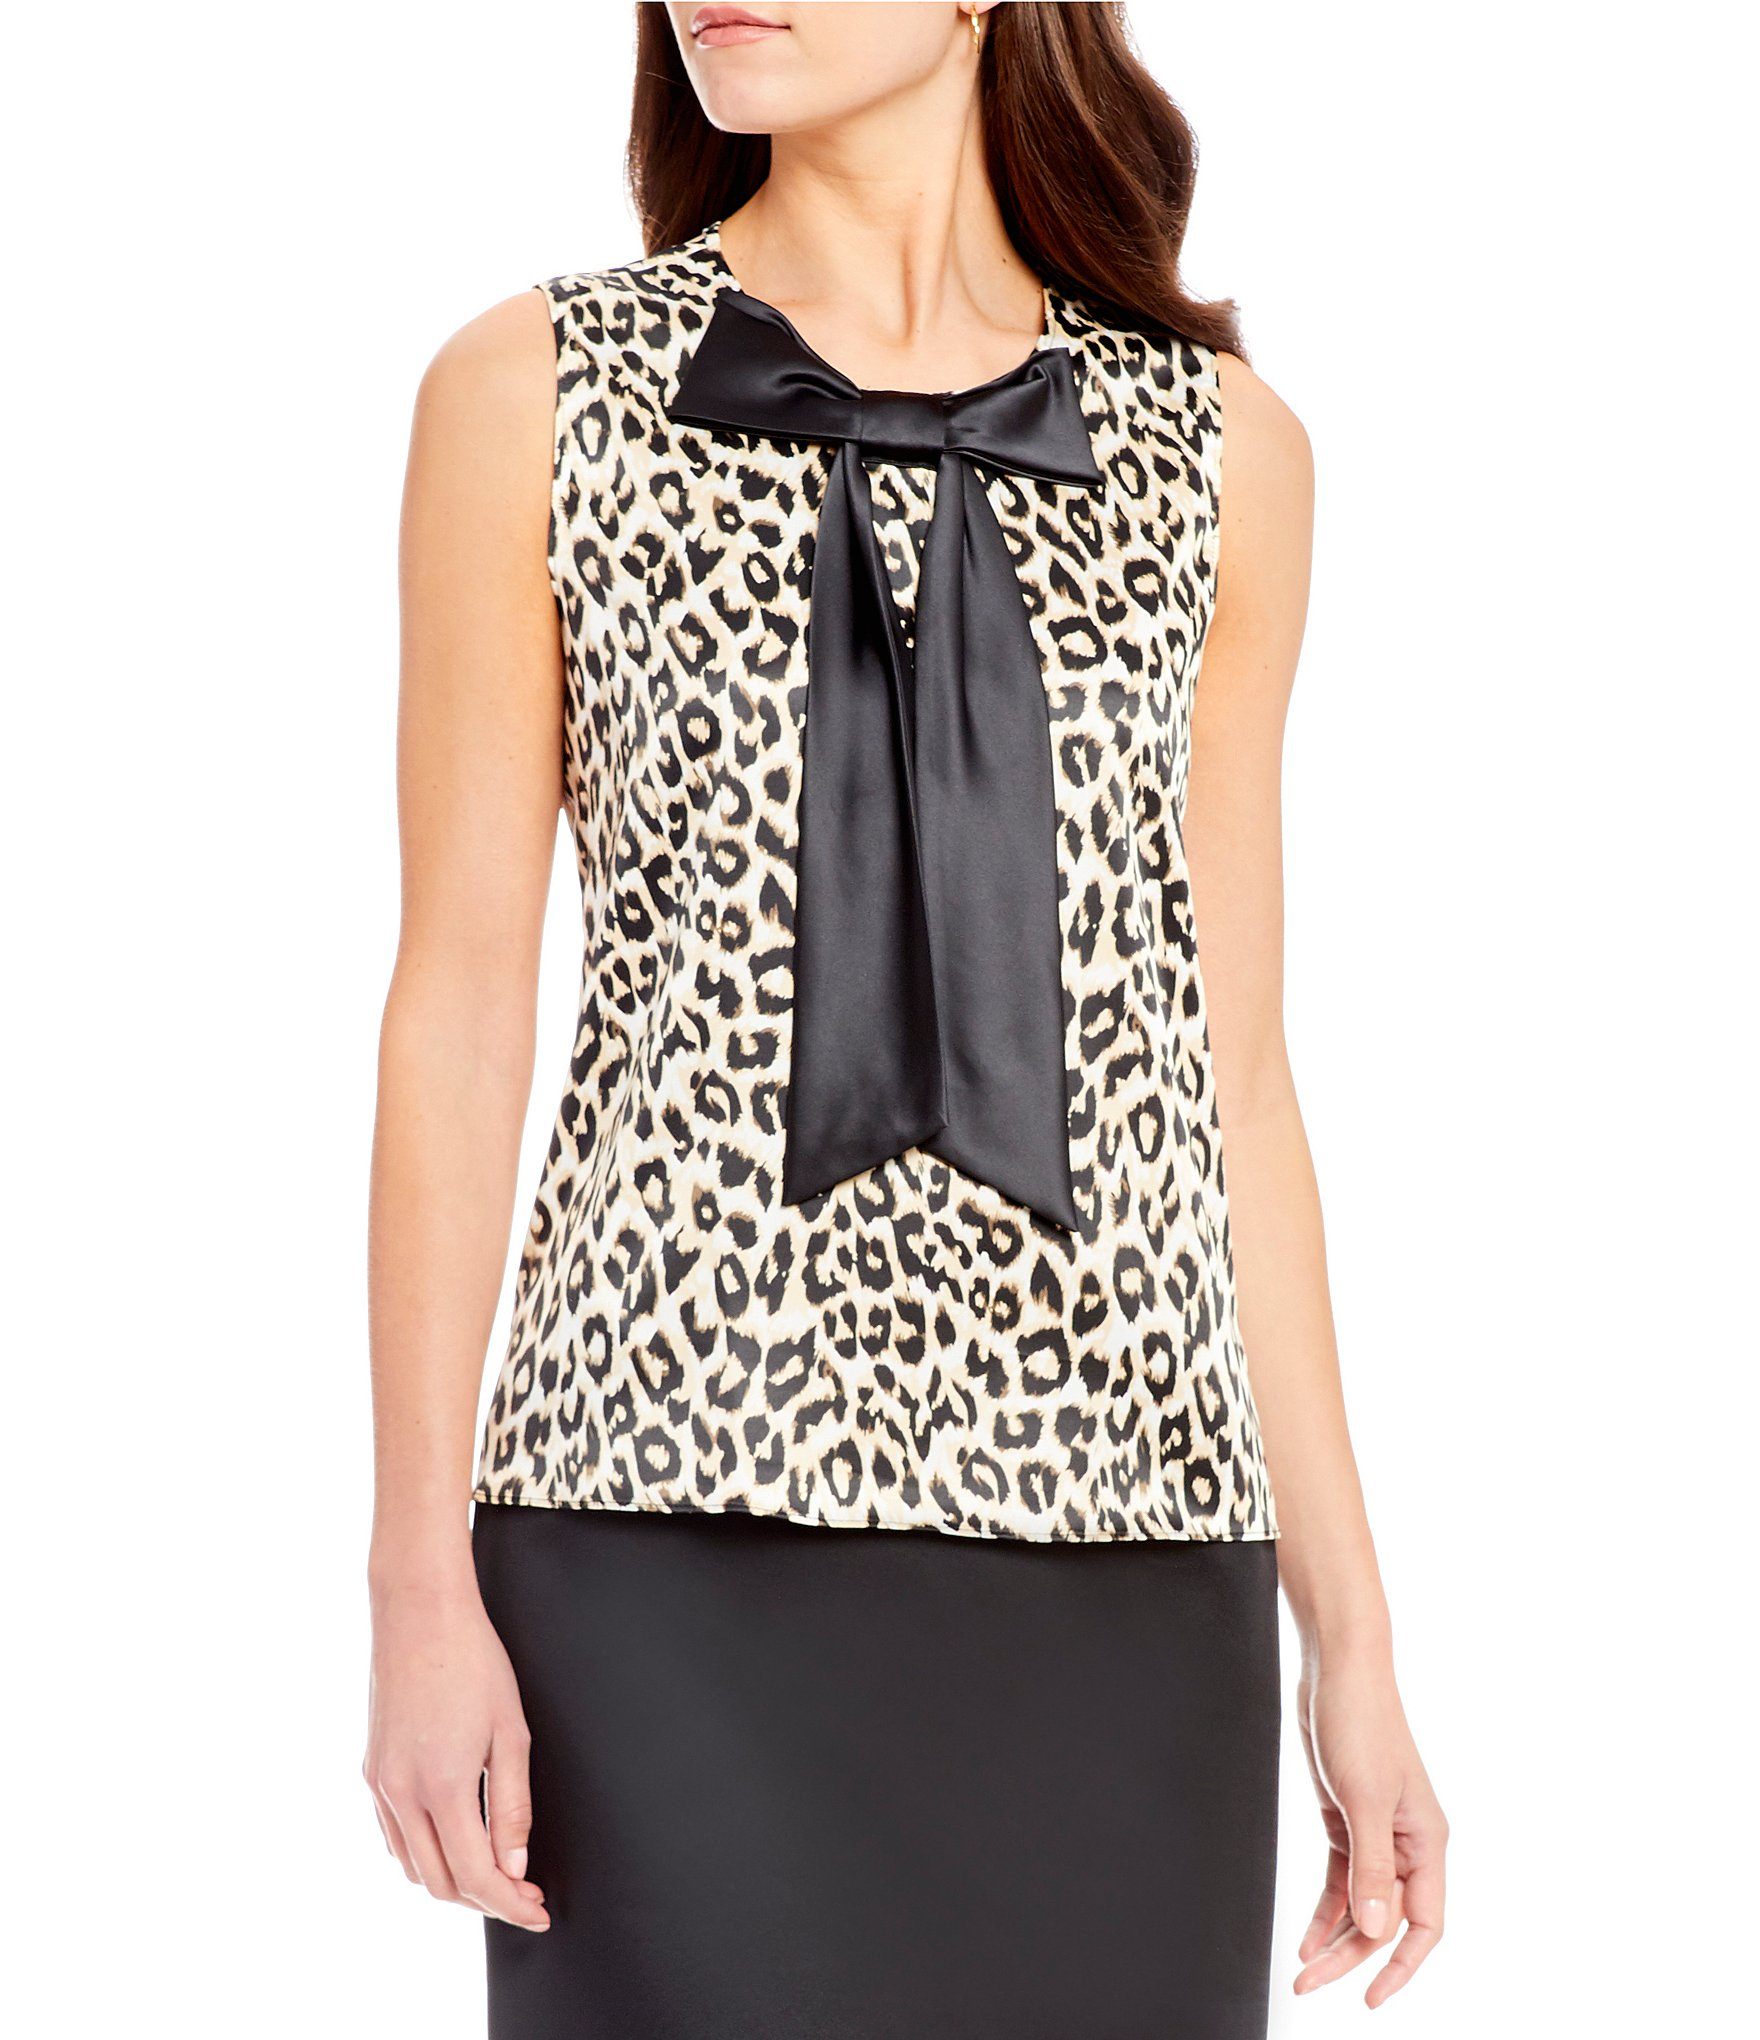 Sleeveless Leopard Print Blouse